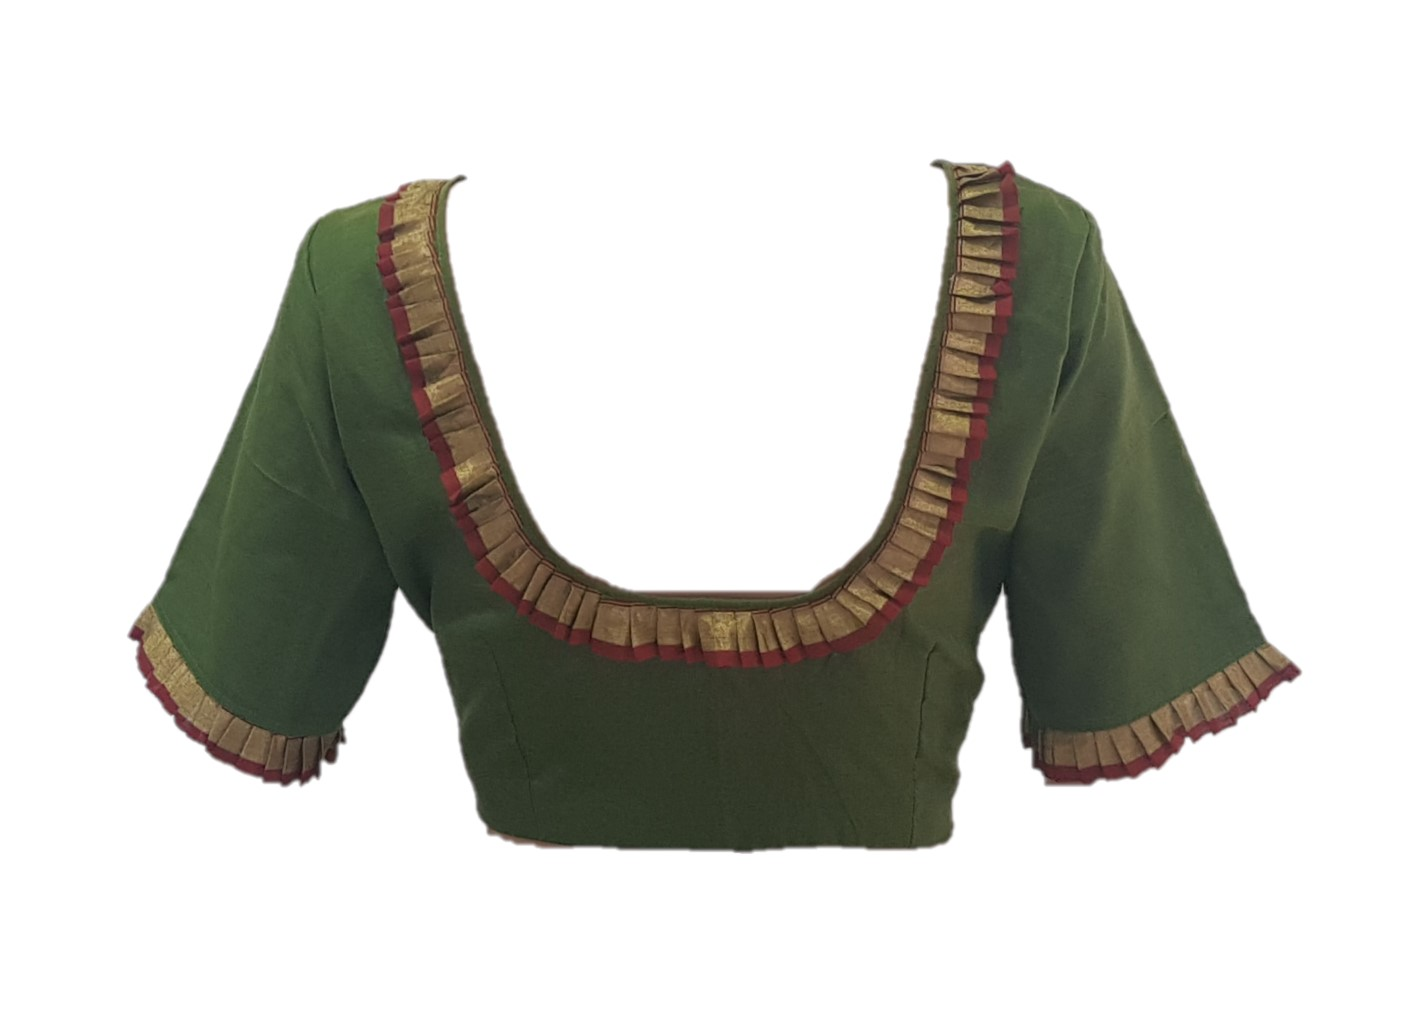 Chanderi Pure Silk Cotton Fabric Neck Frills Readymade Saree Blouse Mehendi Green Size Medium : Picture